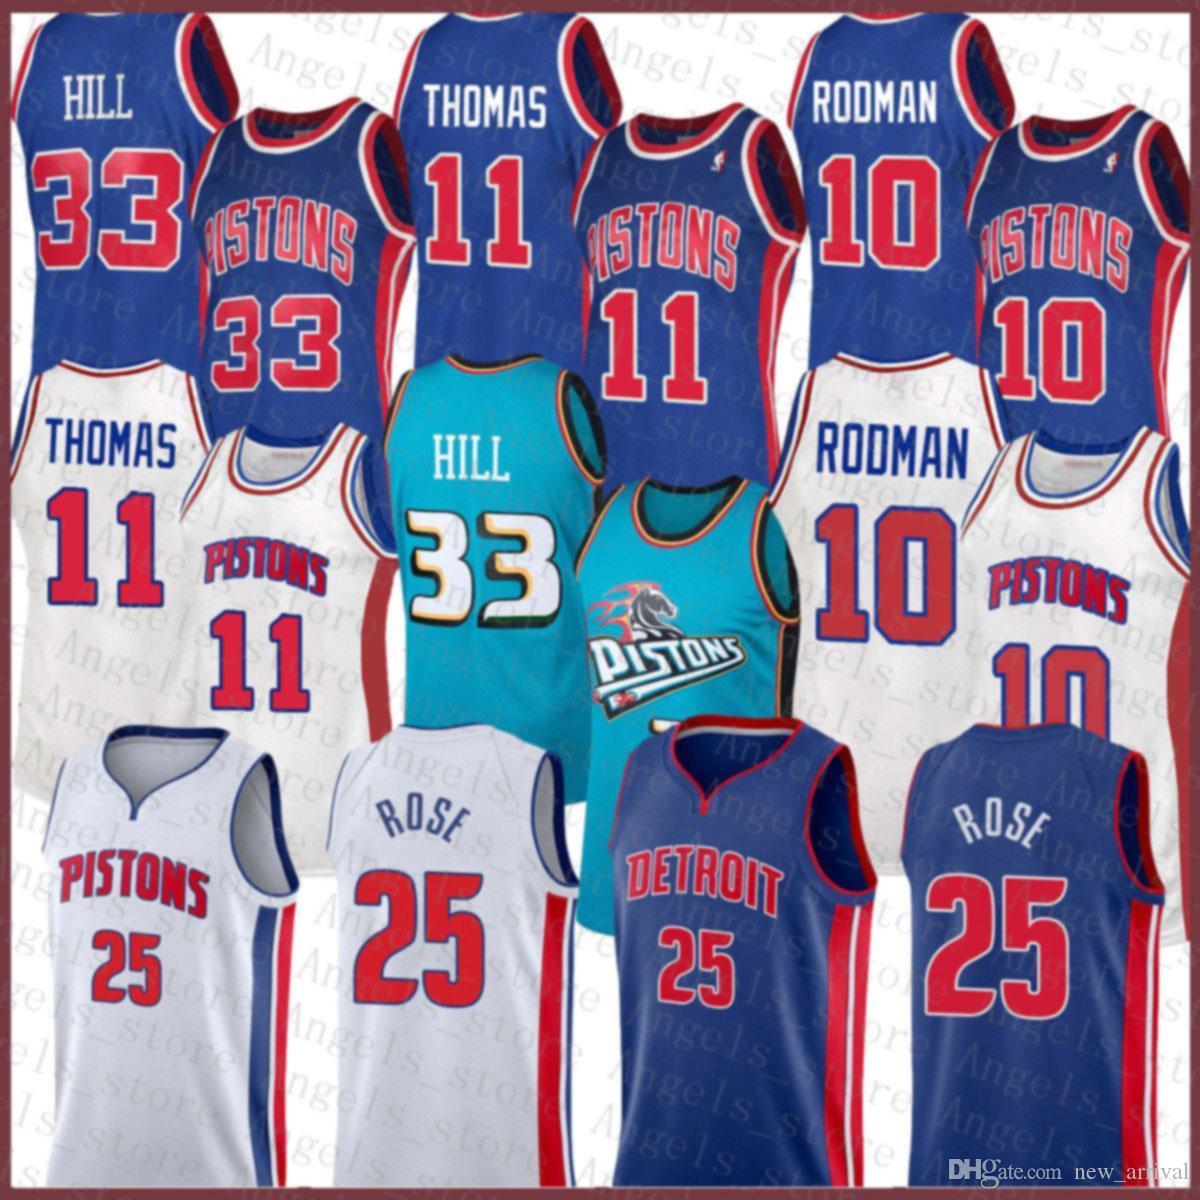 Derrick 25 Rose Isiah 11 Thomas Dennis 10 Rodman Grant 33 Hill DetroitPistão 2020 2021 New Basketball Jersey Brown